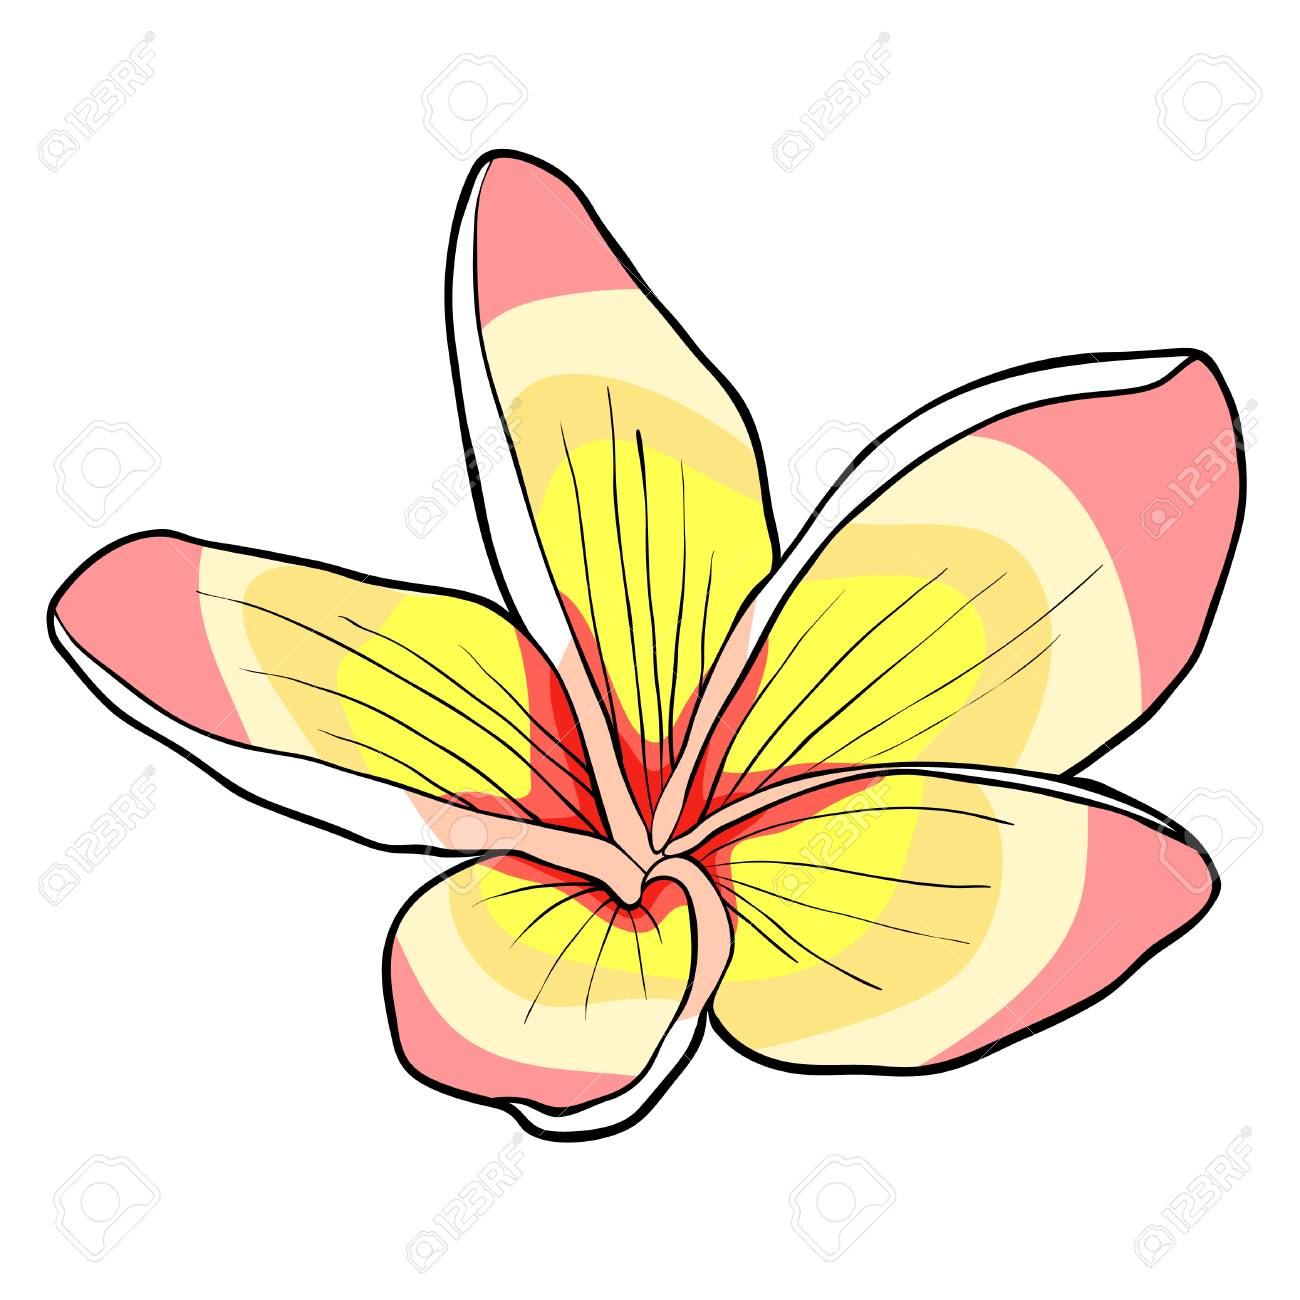 Hawaiian plumeria flower an exotic vector illustration royalty free hawaiian plumeria flower an exotic vector illustration stock vector 91032859 izmirmasajfo